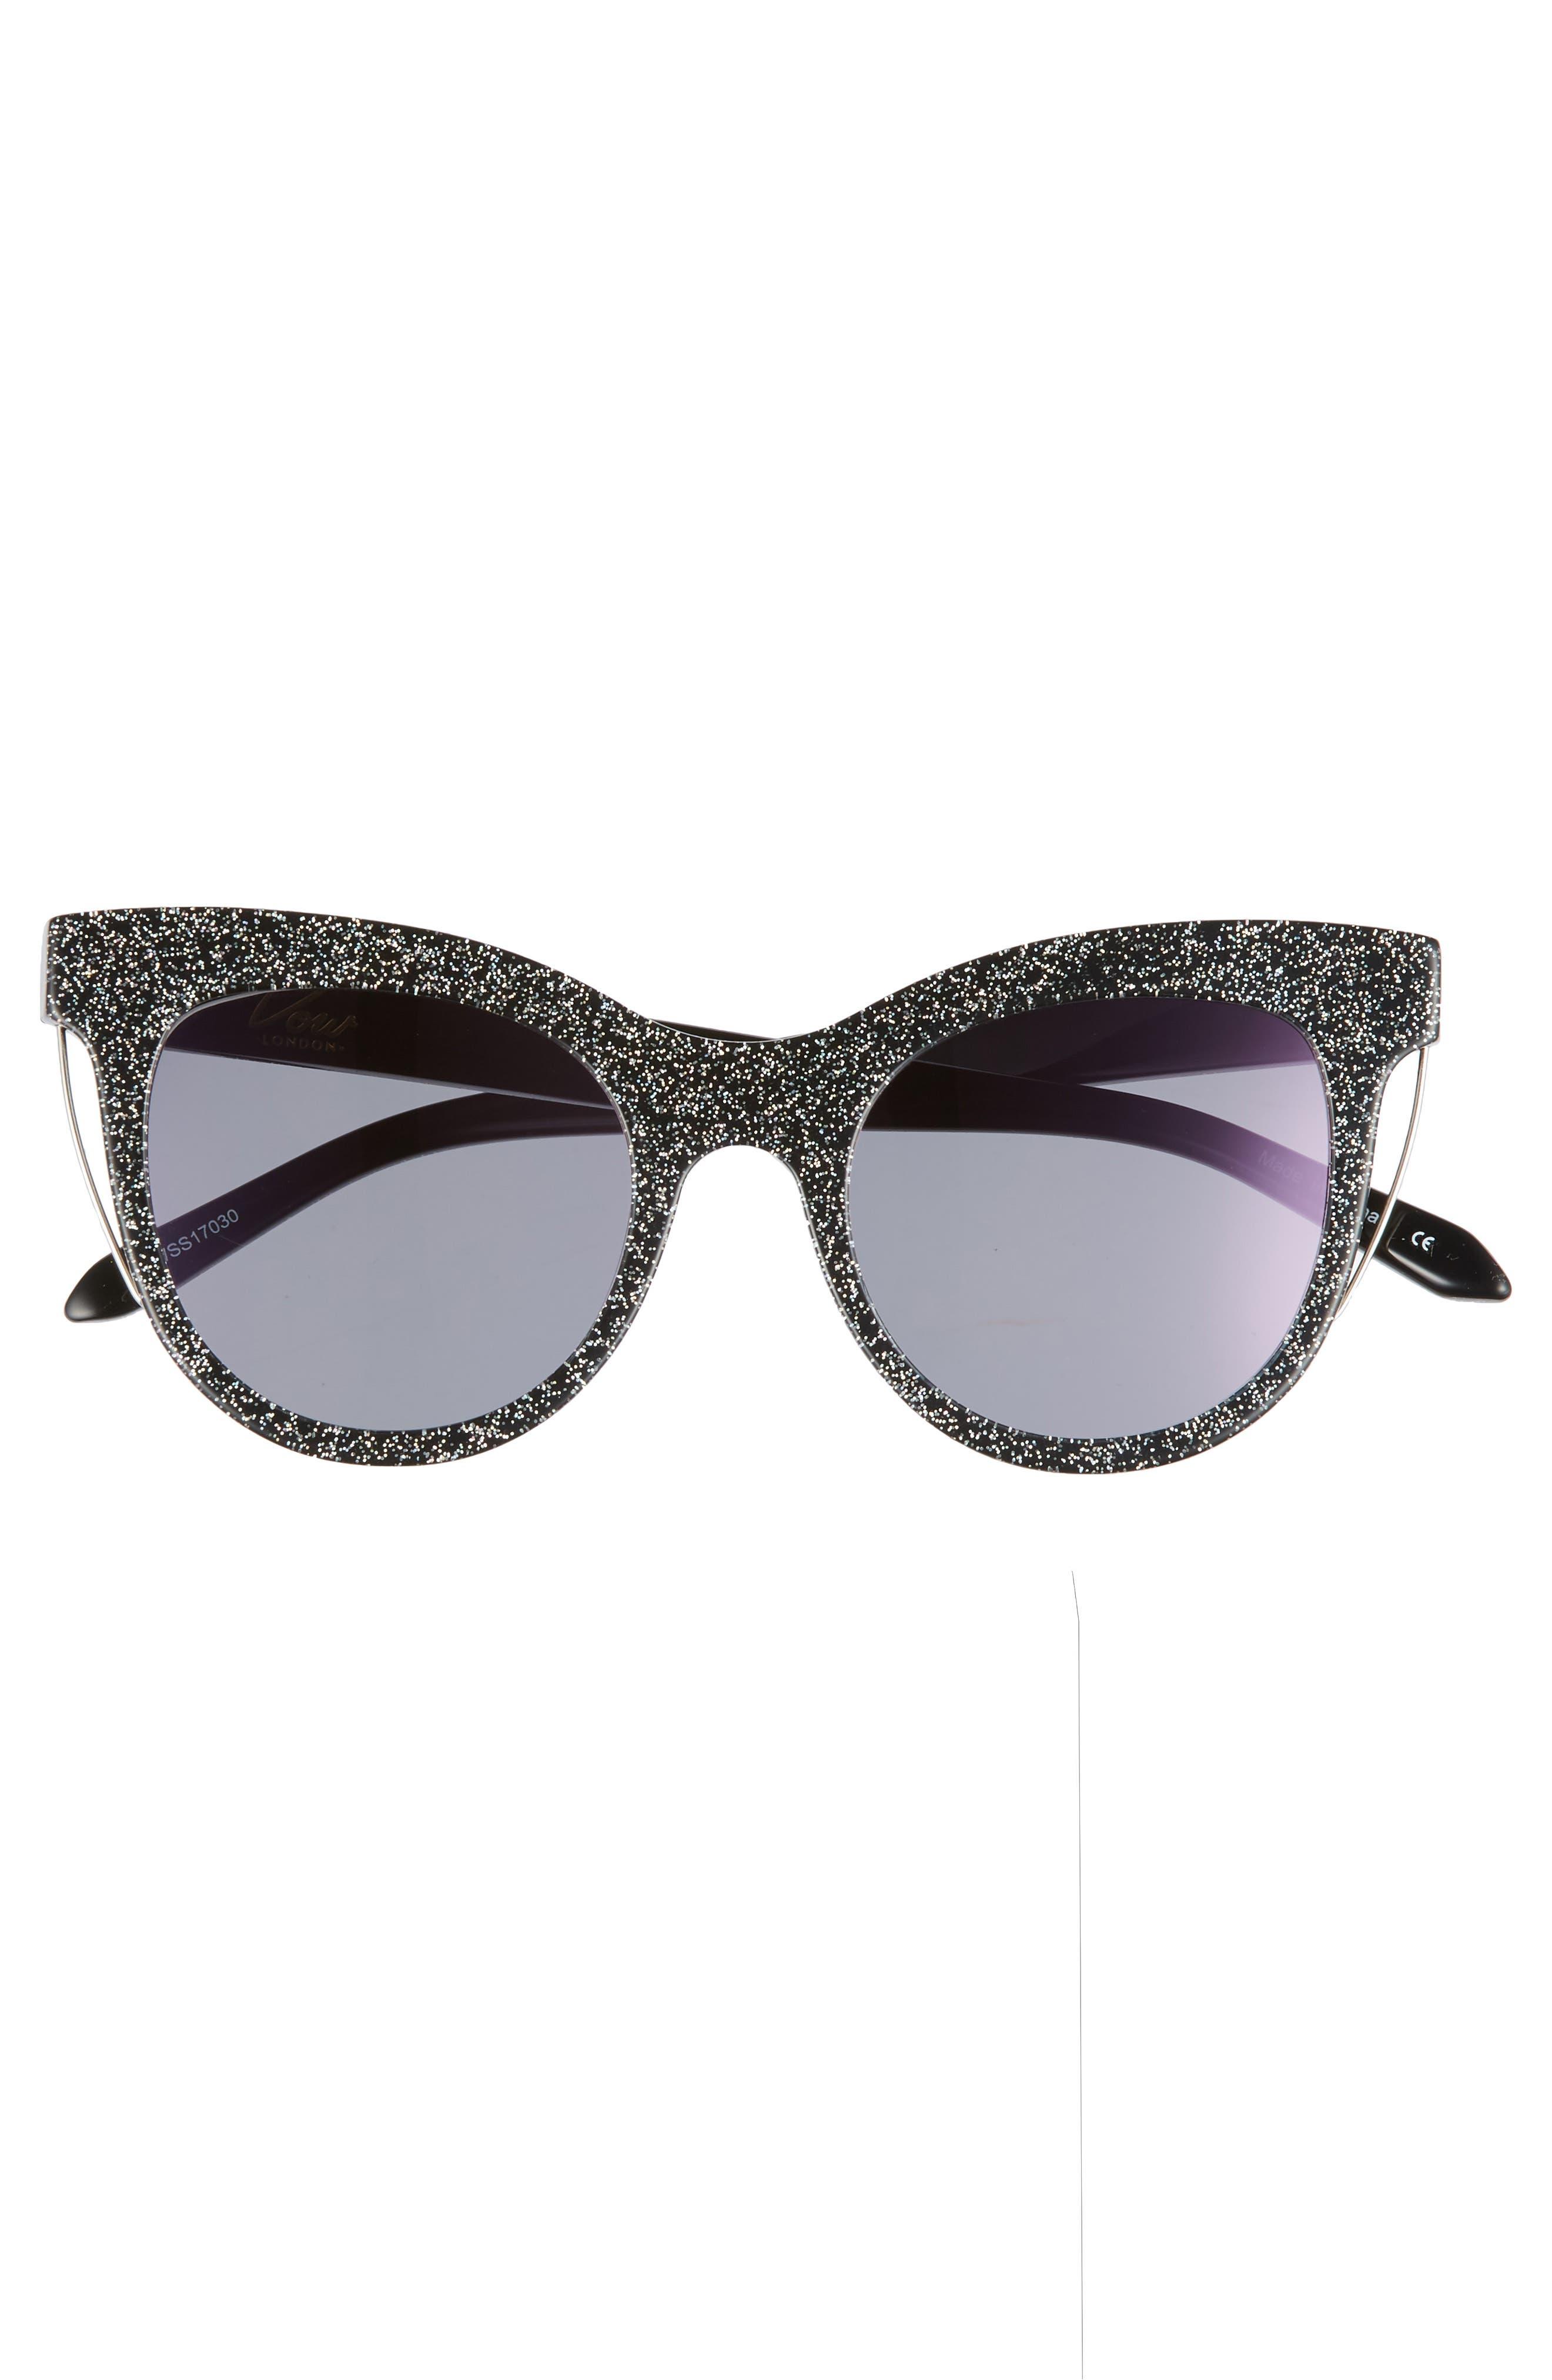 Sloane 52mm Cat Eye Sunglasses,                             Alternate thumbnail 3, color,                             Multi Glitter/ Purple Flash